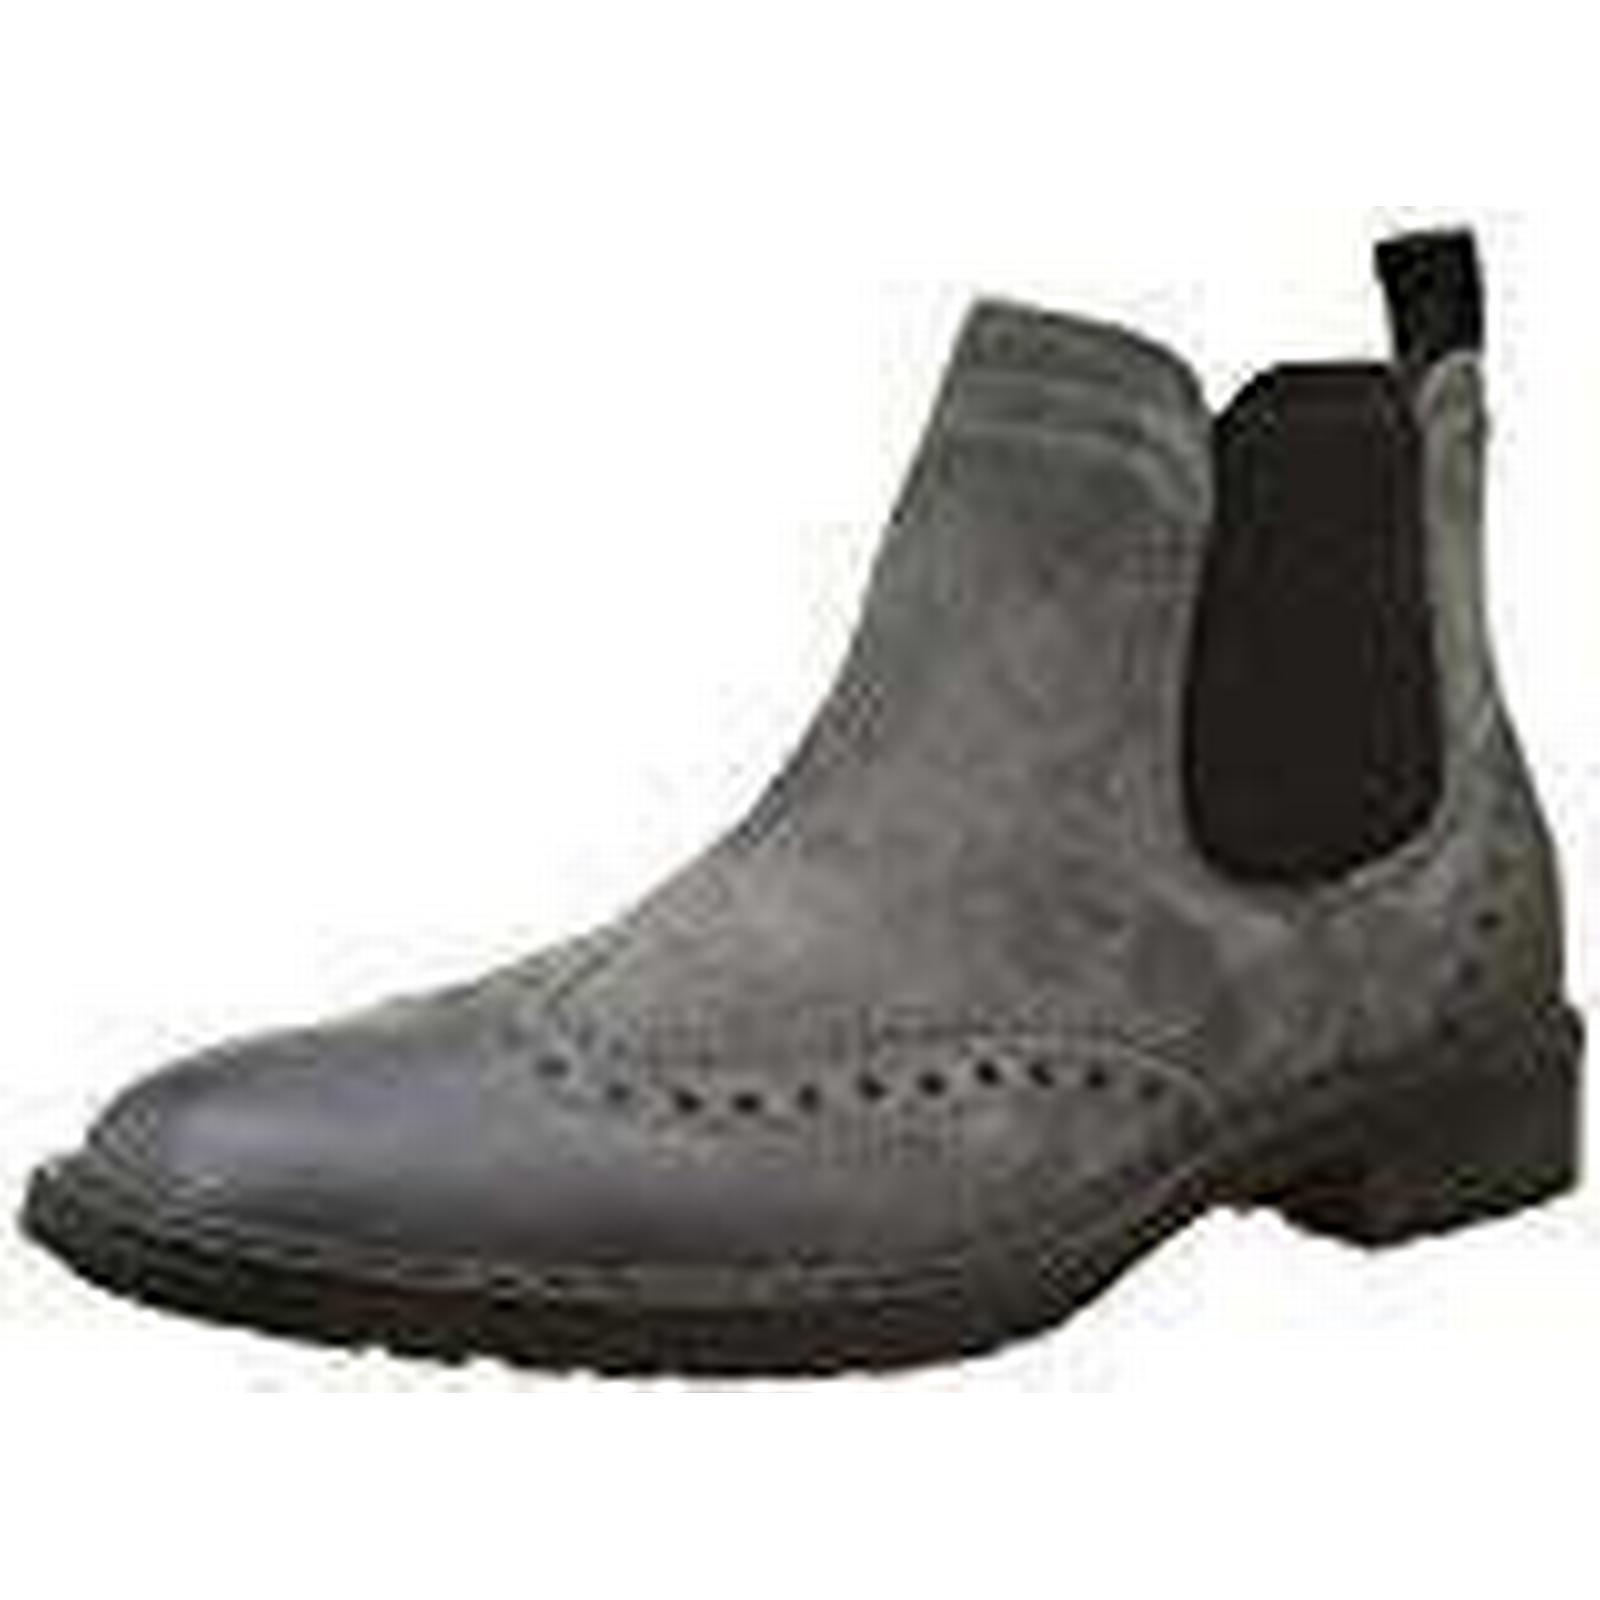 Geox Men''s 10.5 U Kapsian D Chelsea Boots, Grey (Anthracite), 10.5 Men''s UK 10.5 UK 9a7e91